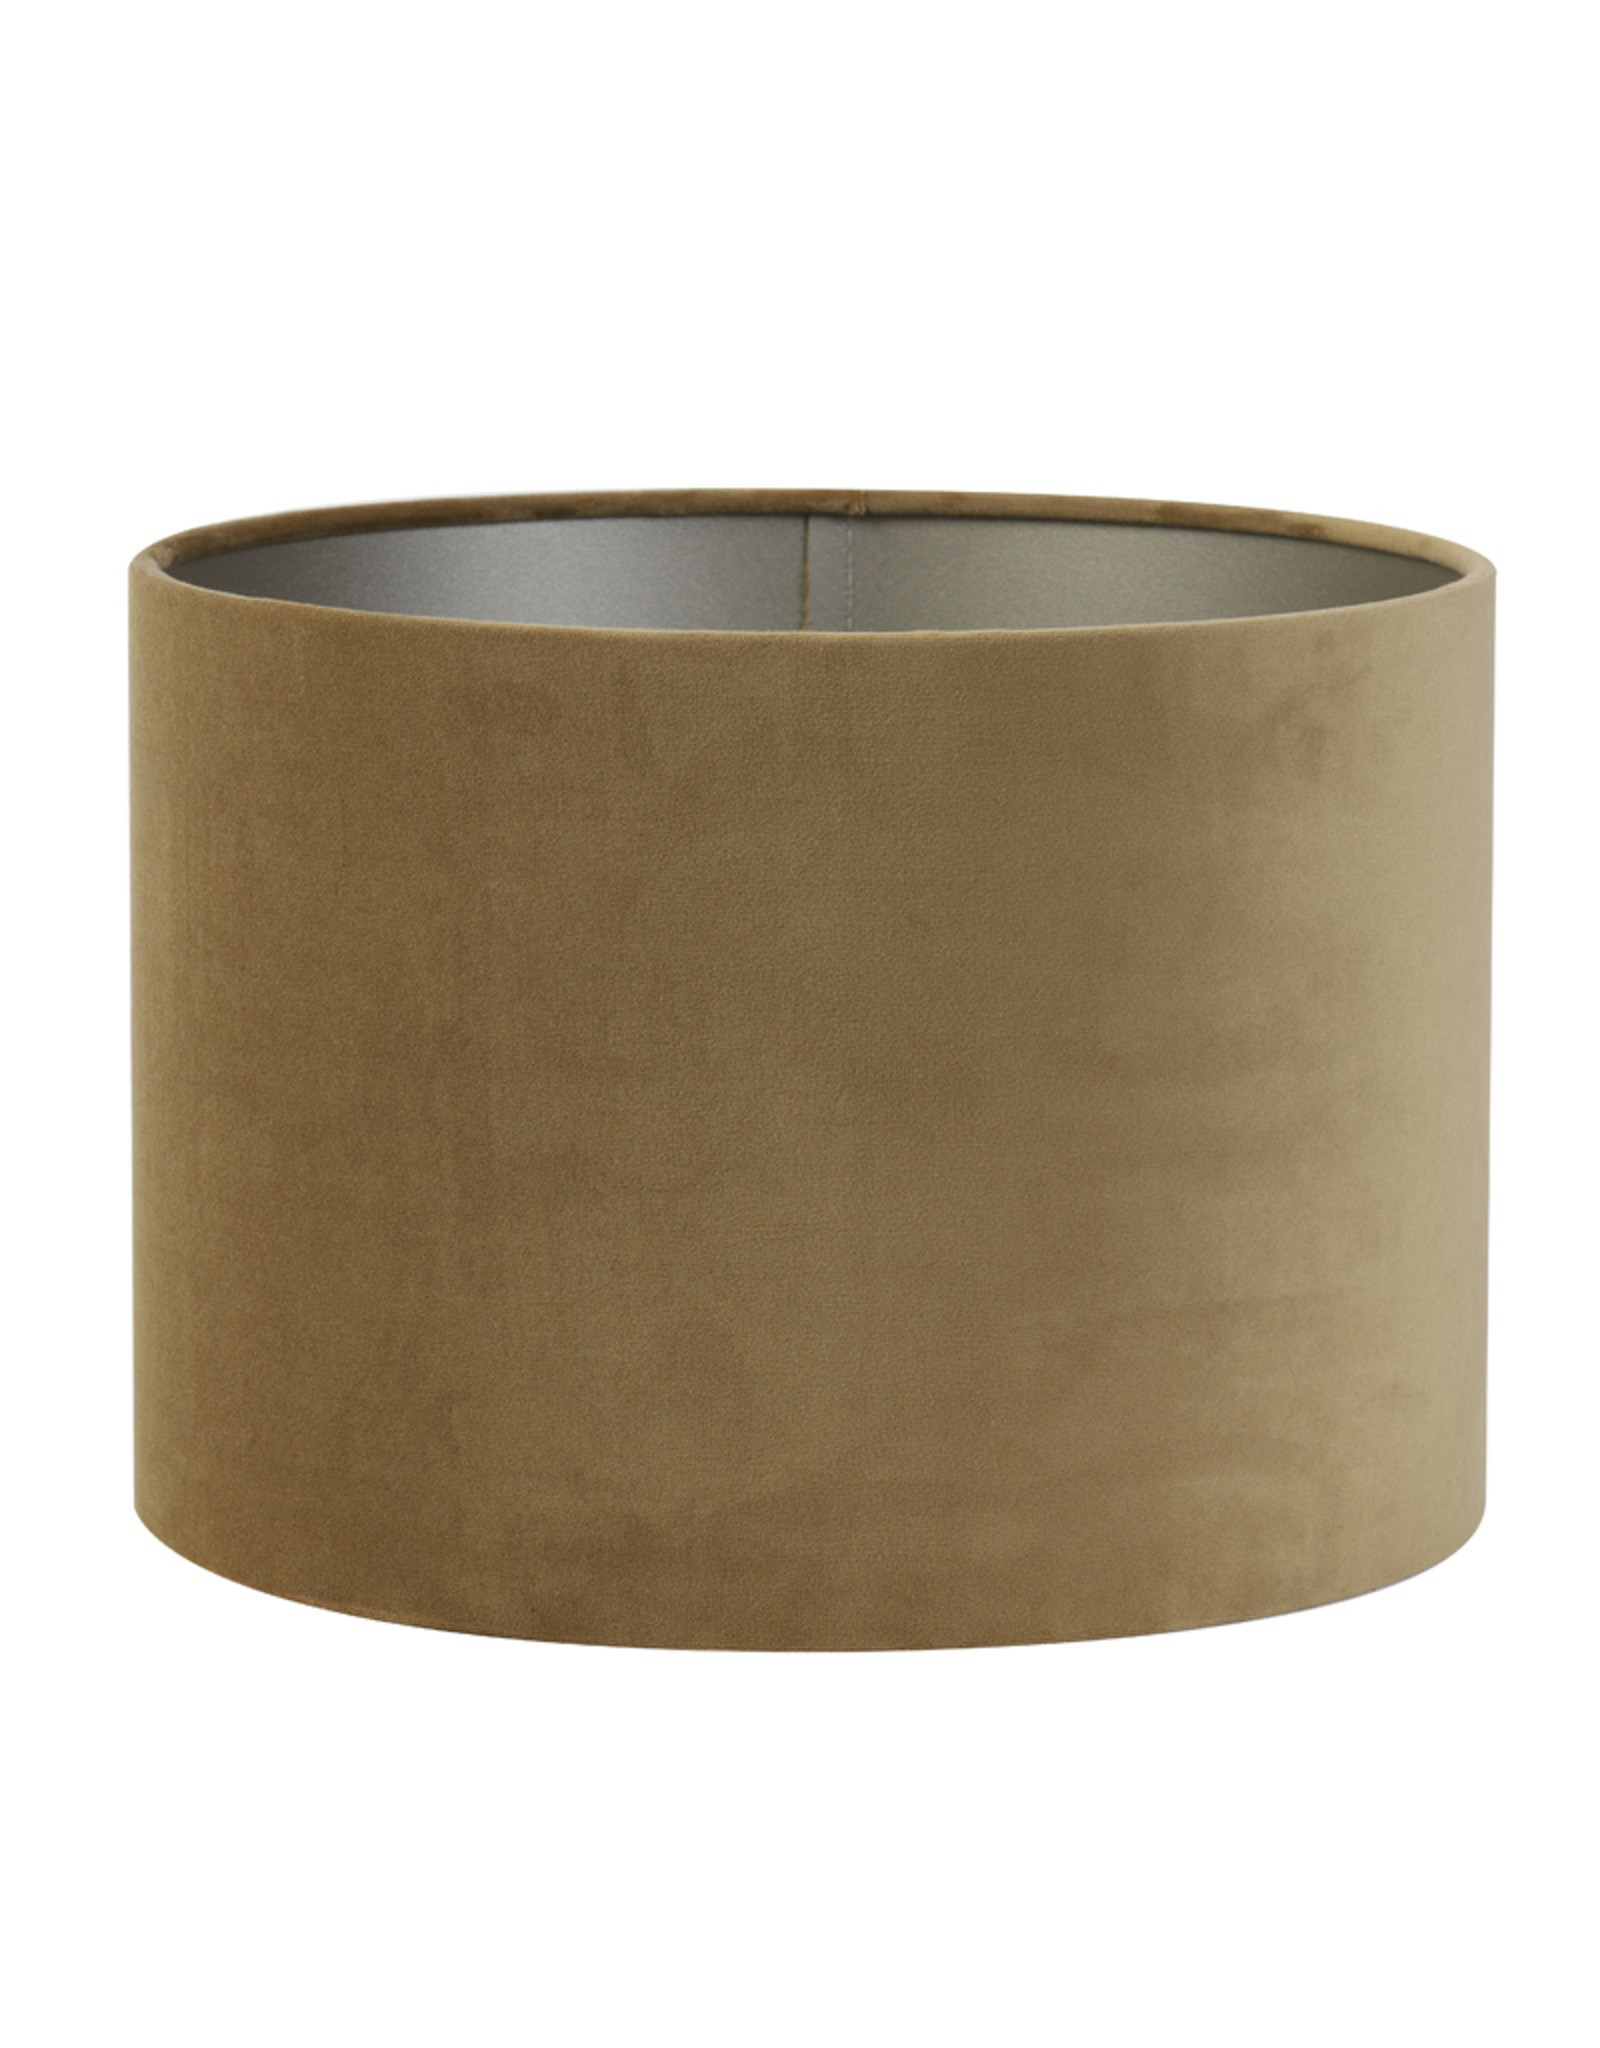 Light & Living Kap cilinder 25-25-18cm velours karamel